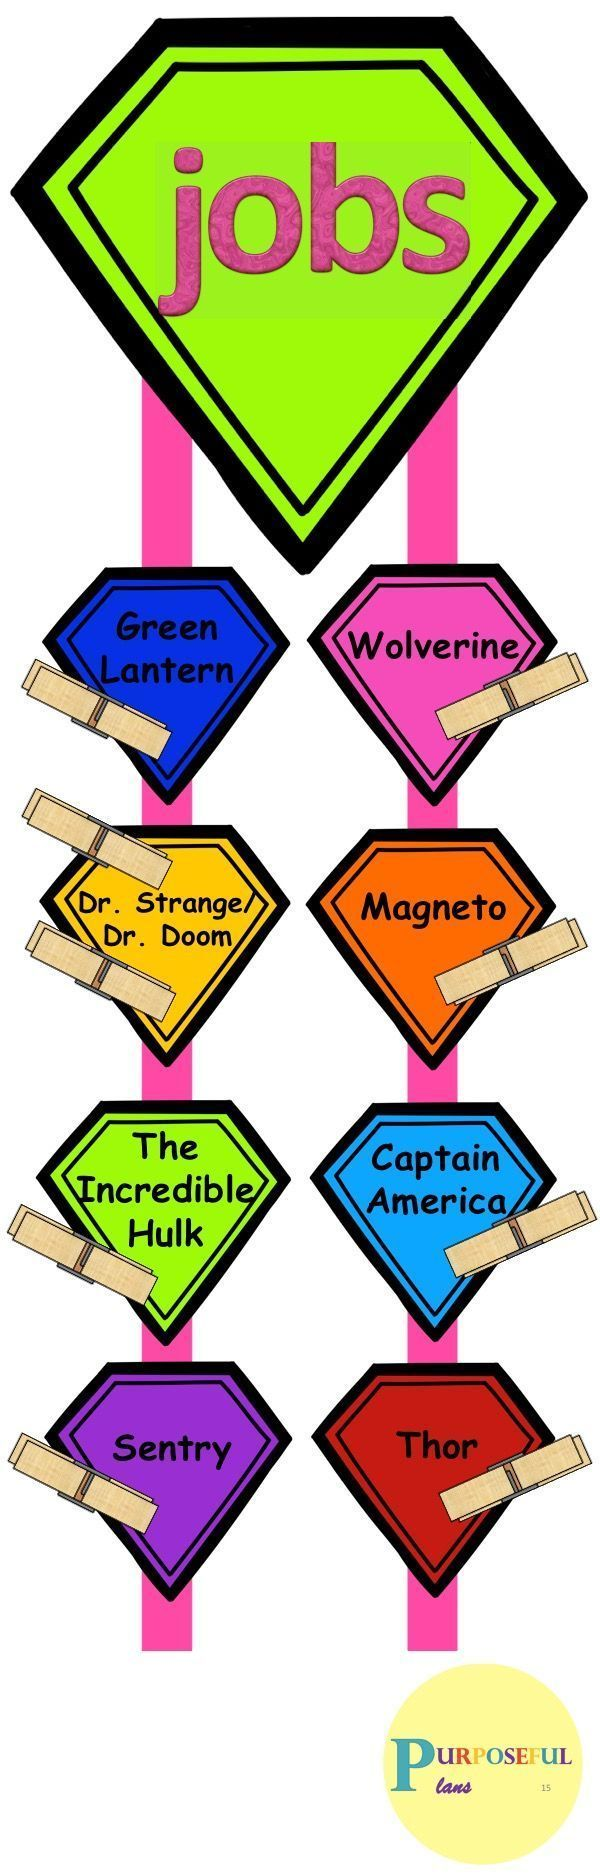 #Educational #Classrooms #ClassroomManagement #Editable #Tpt